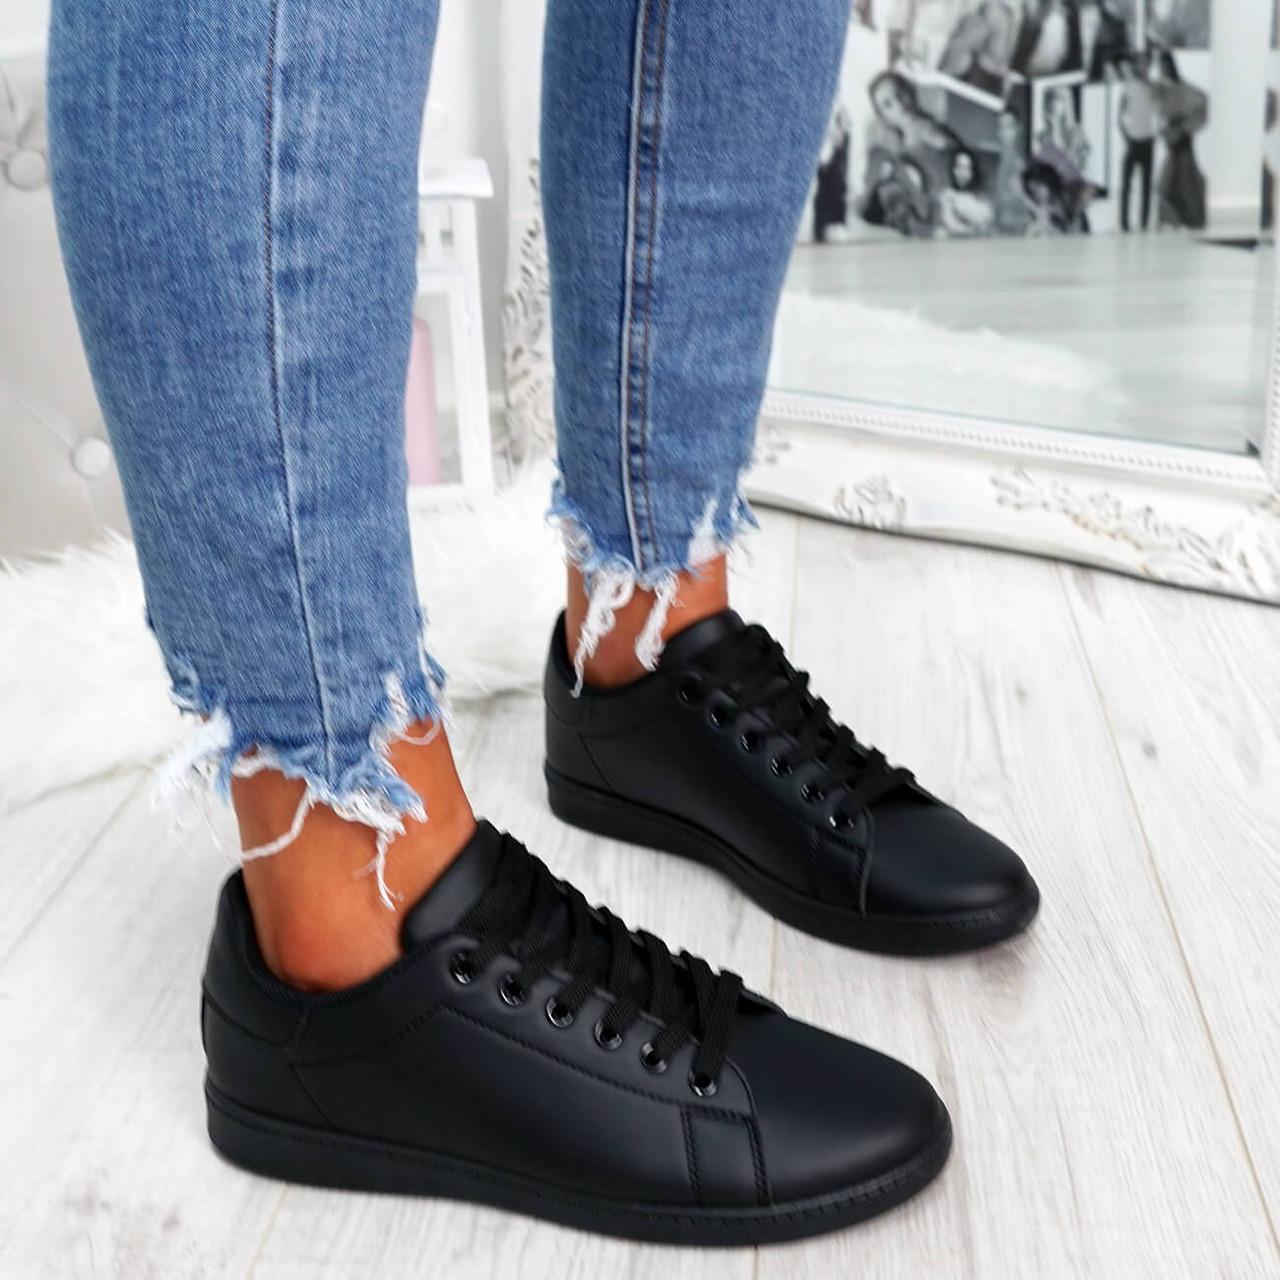 black stylish trainers